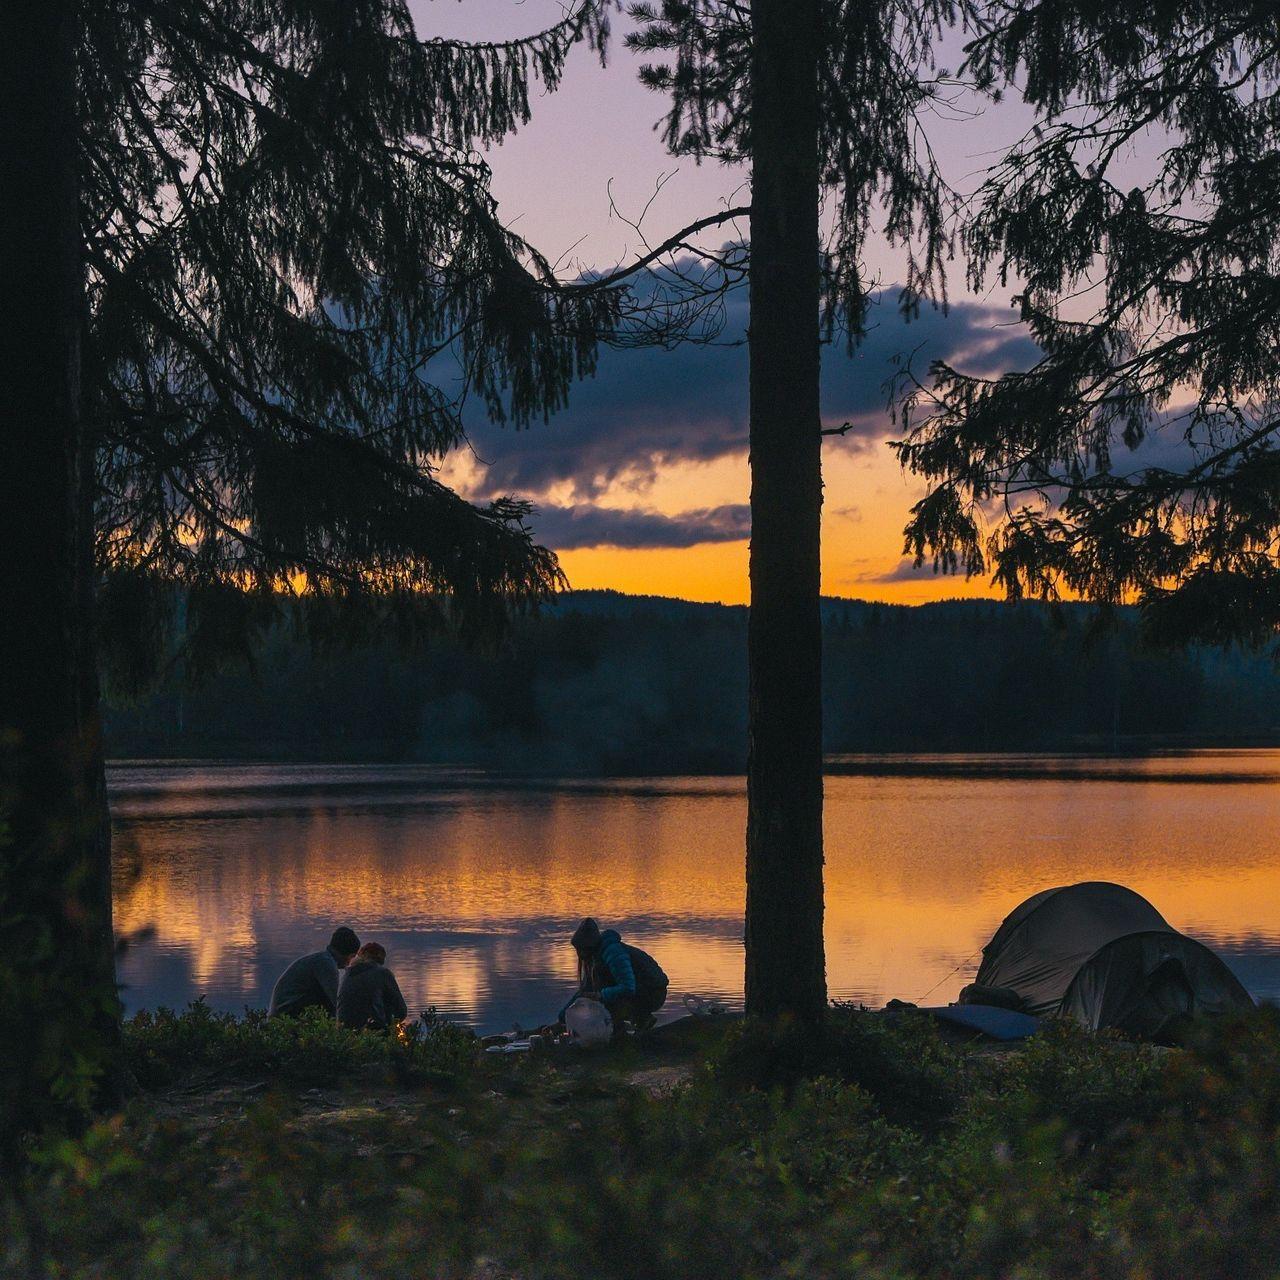 Camping sc6fxi